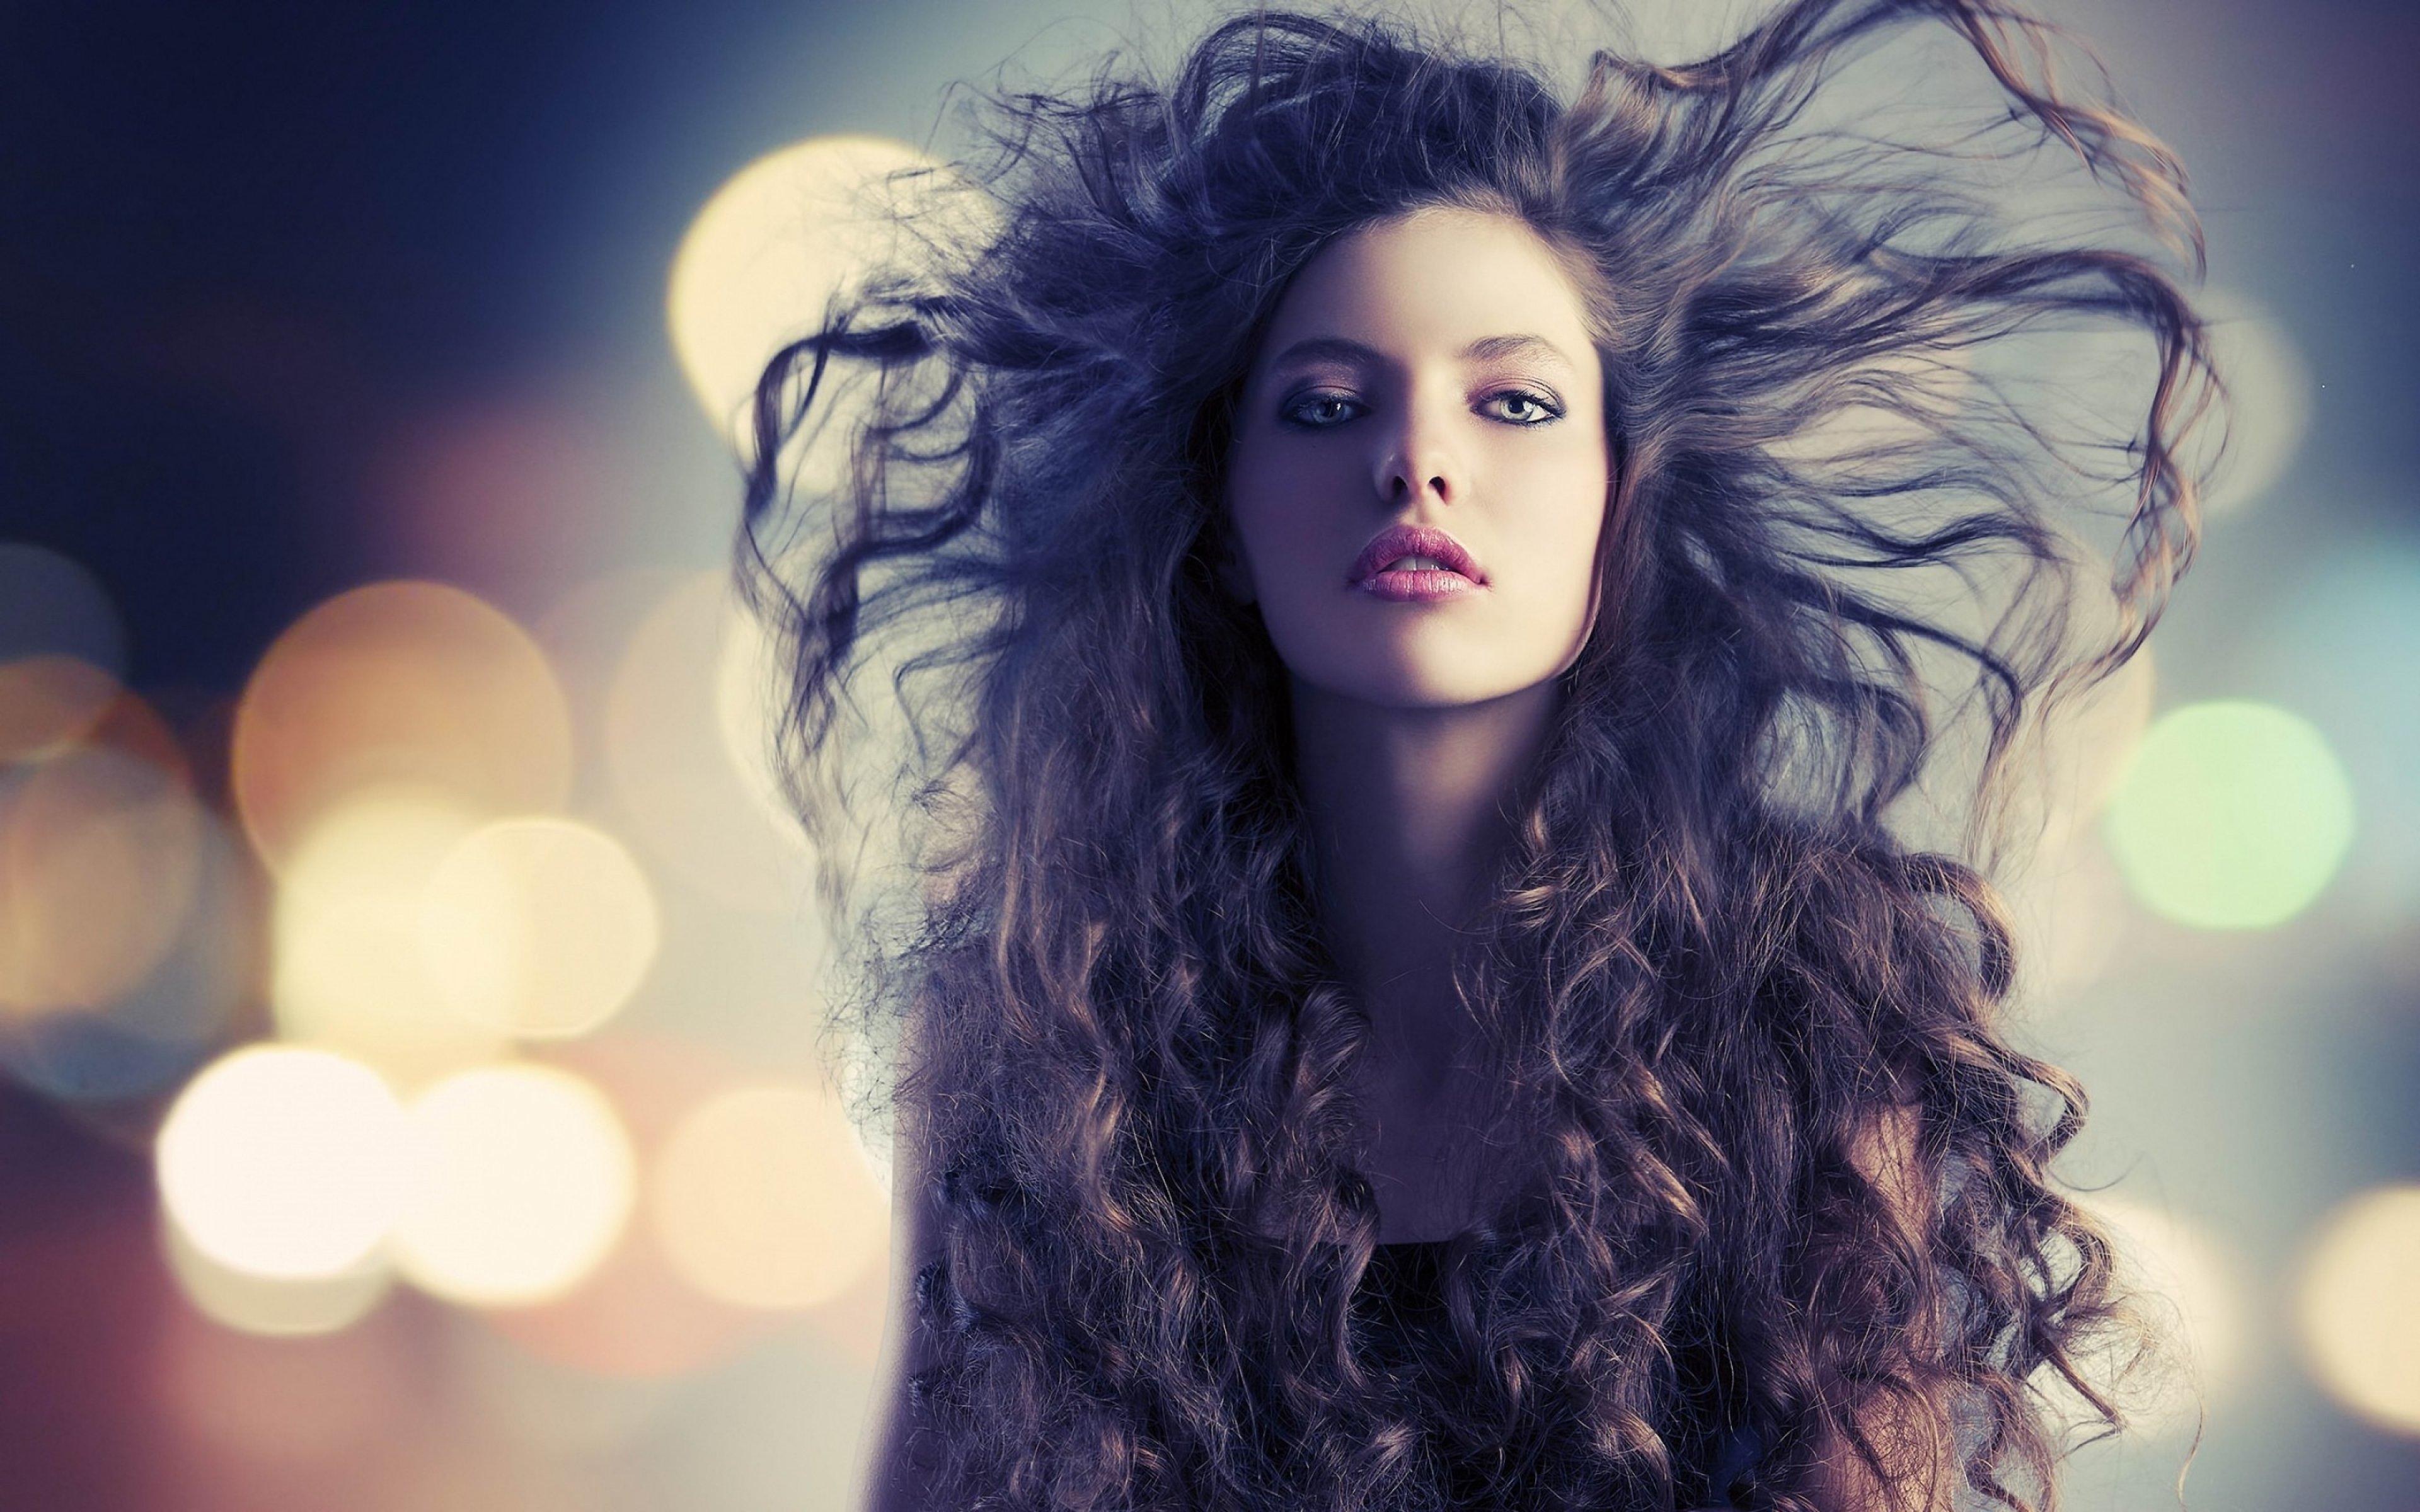 Fashion Beauty Hair: Hair Model Woman Women Models Style Beauty Fashion Girl